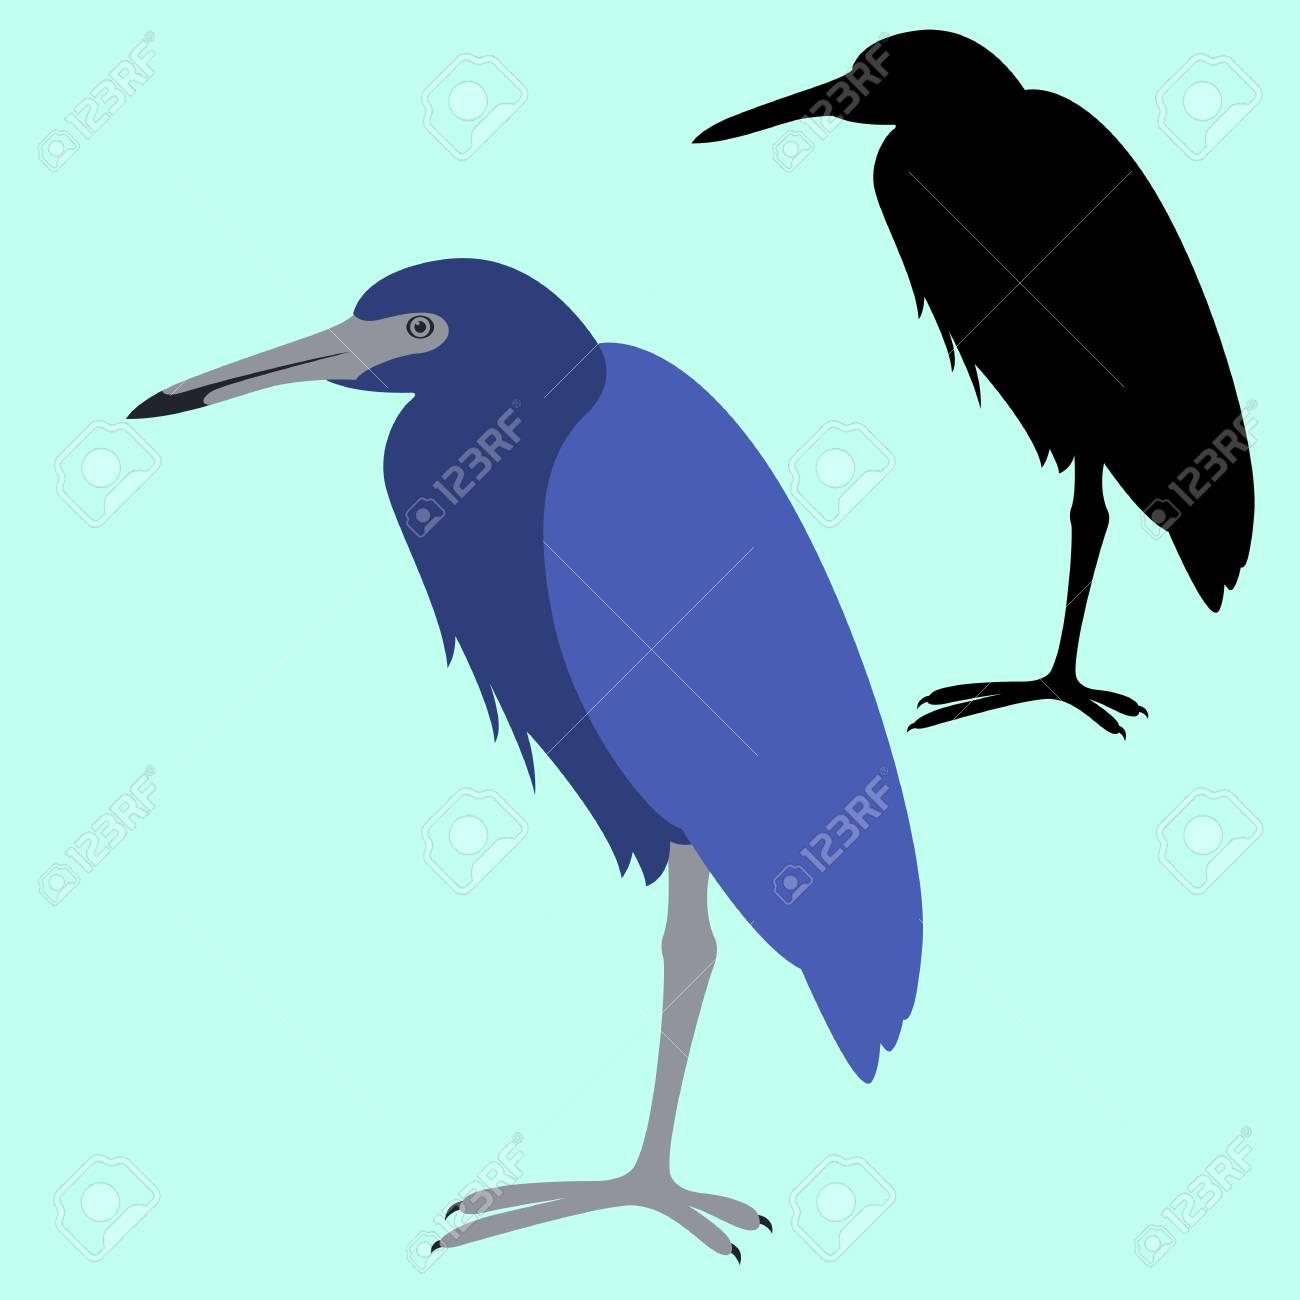 blue heron vector illustration flat style profile side black